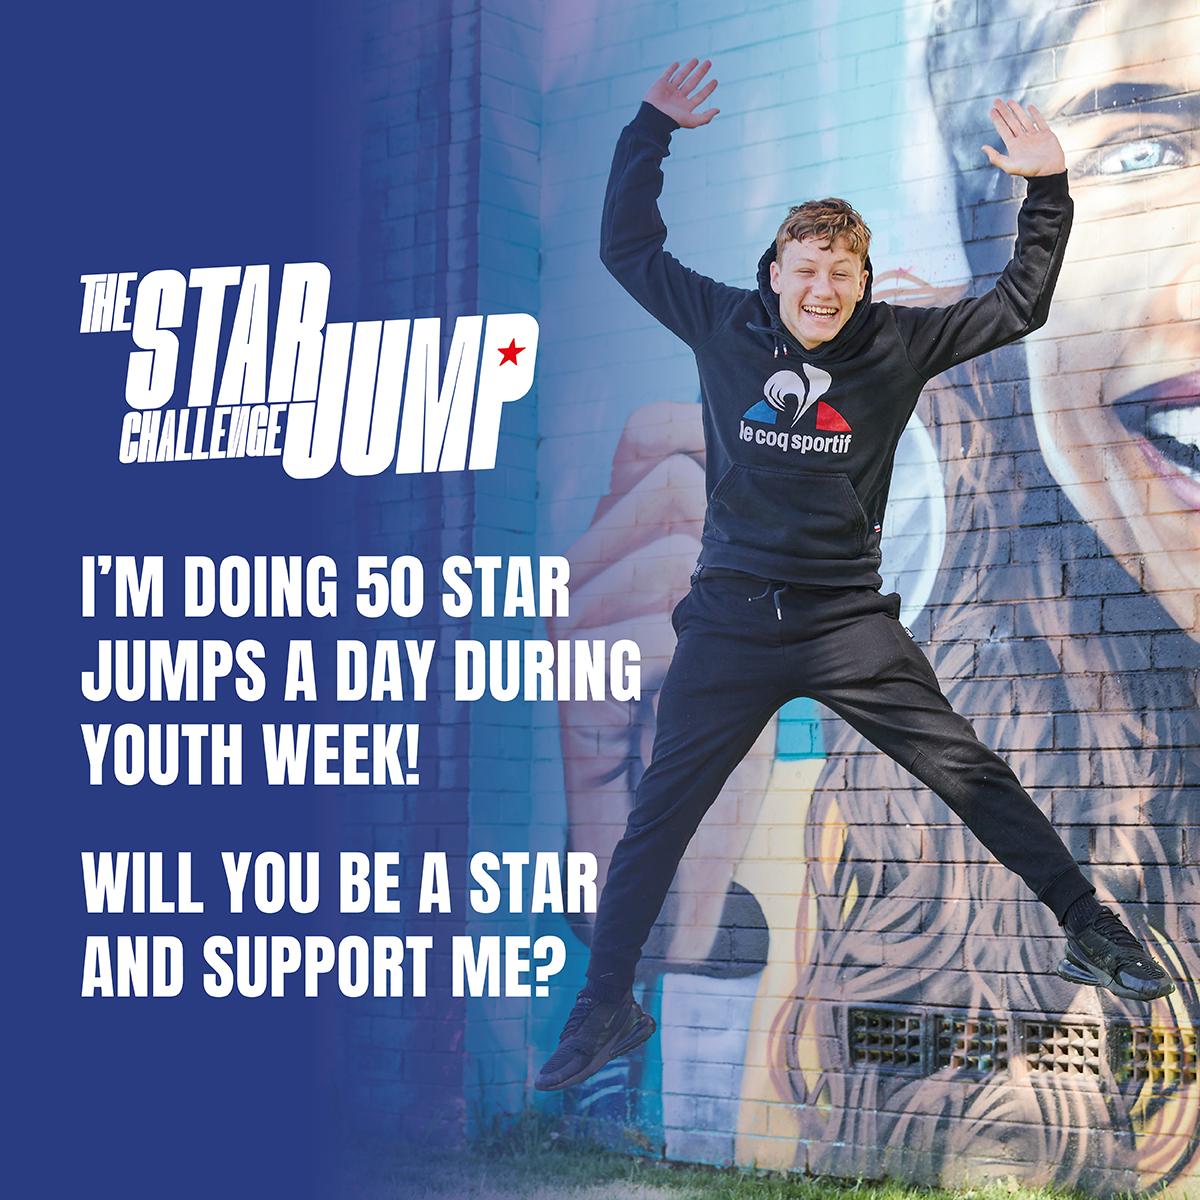 Social Tile 8 - Support - 50 Star Jumps